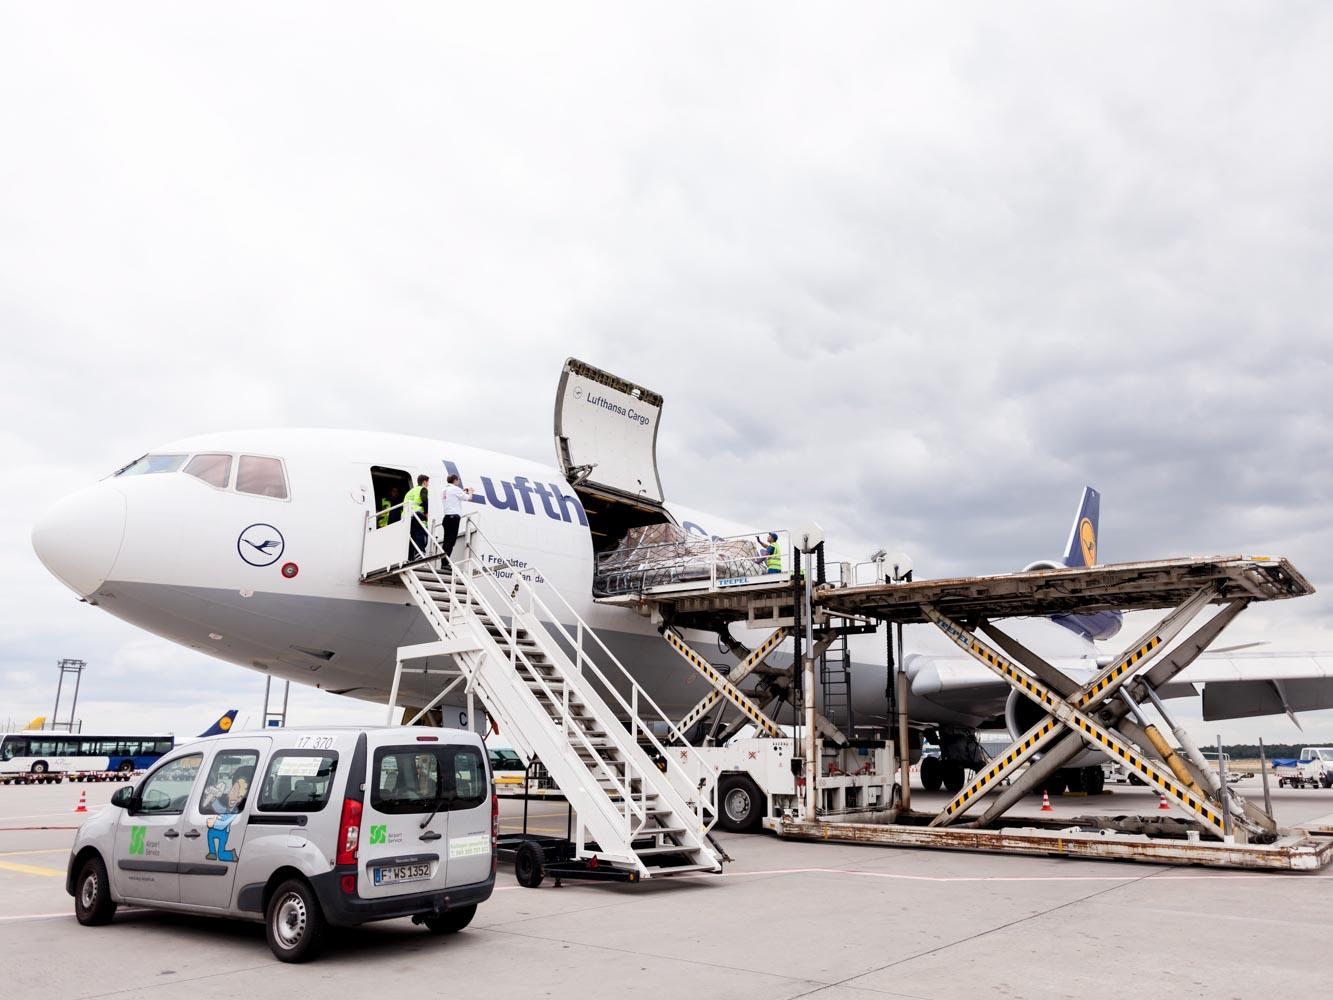 reportage_daniel_kummer-lufthansa_cargo_dahw_2018-06